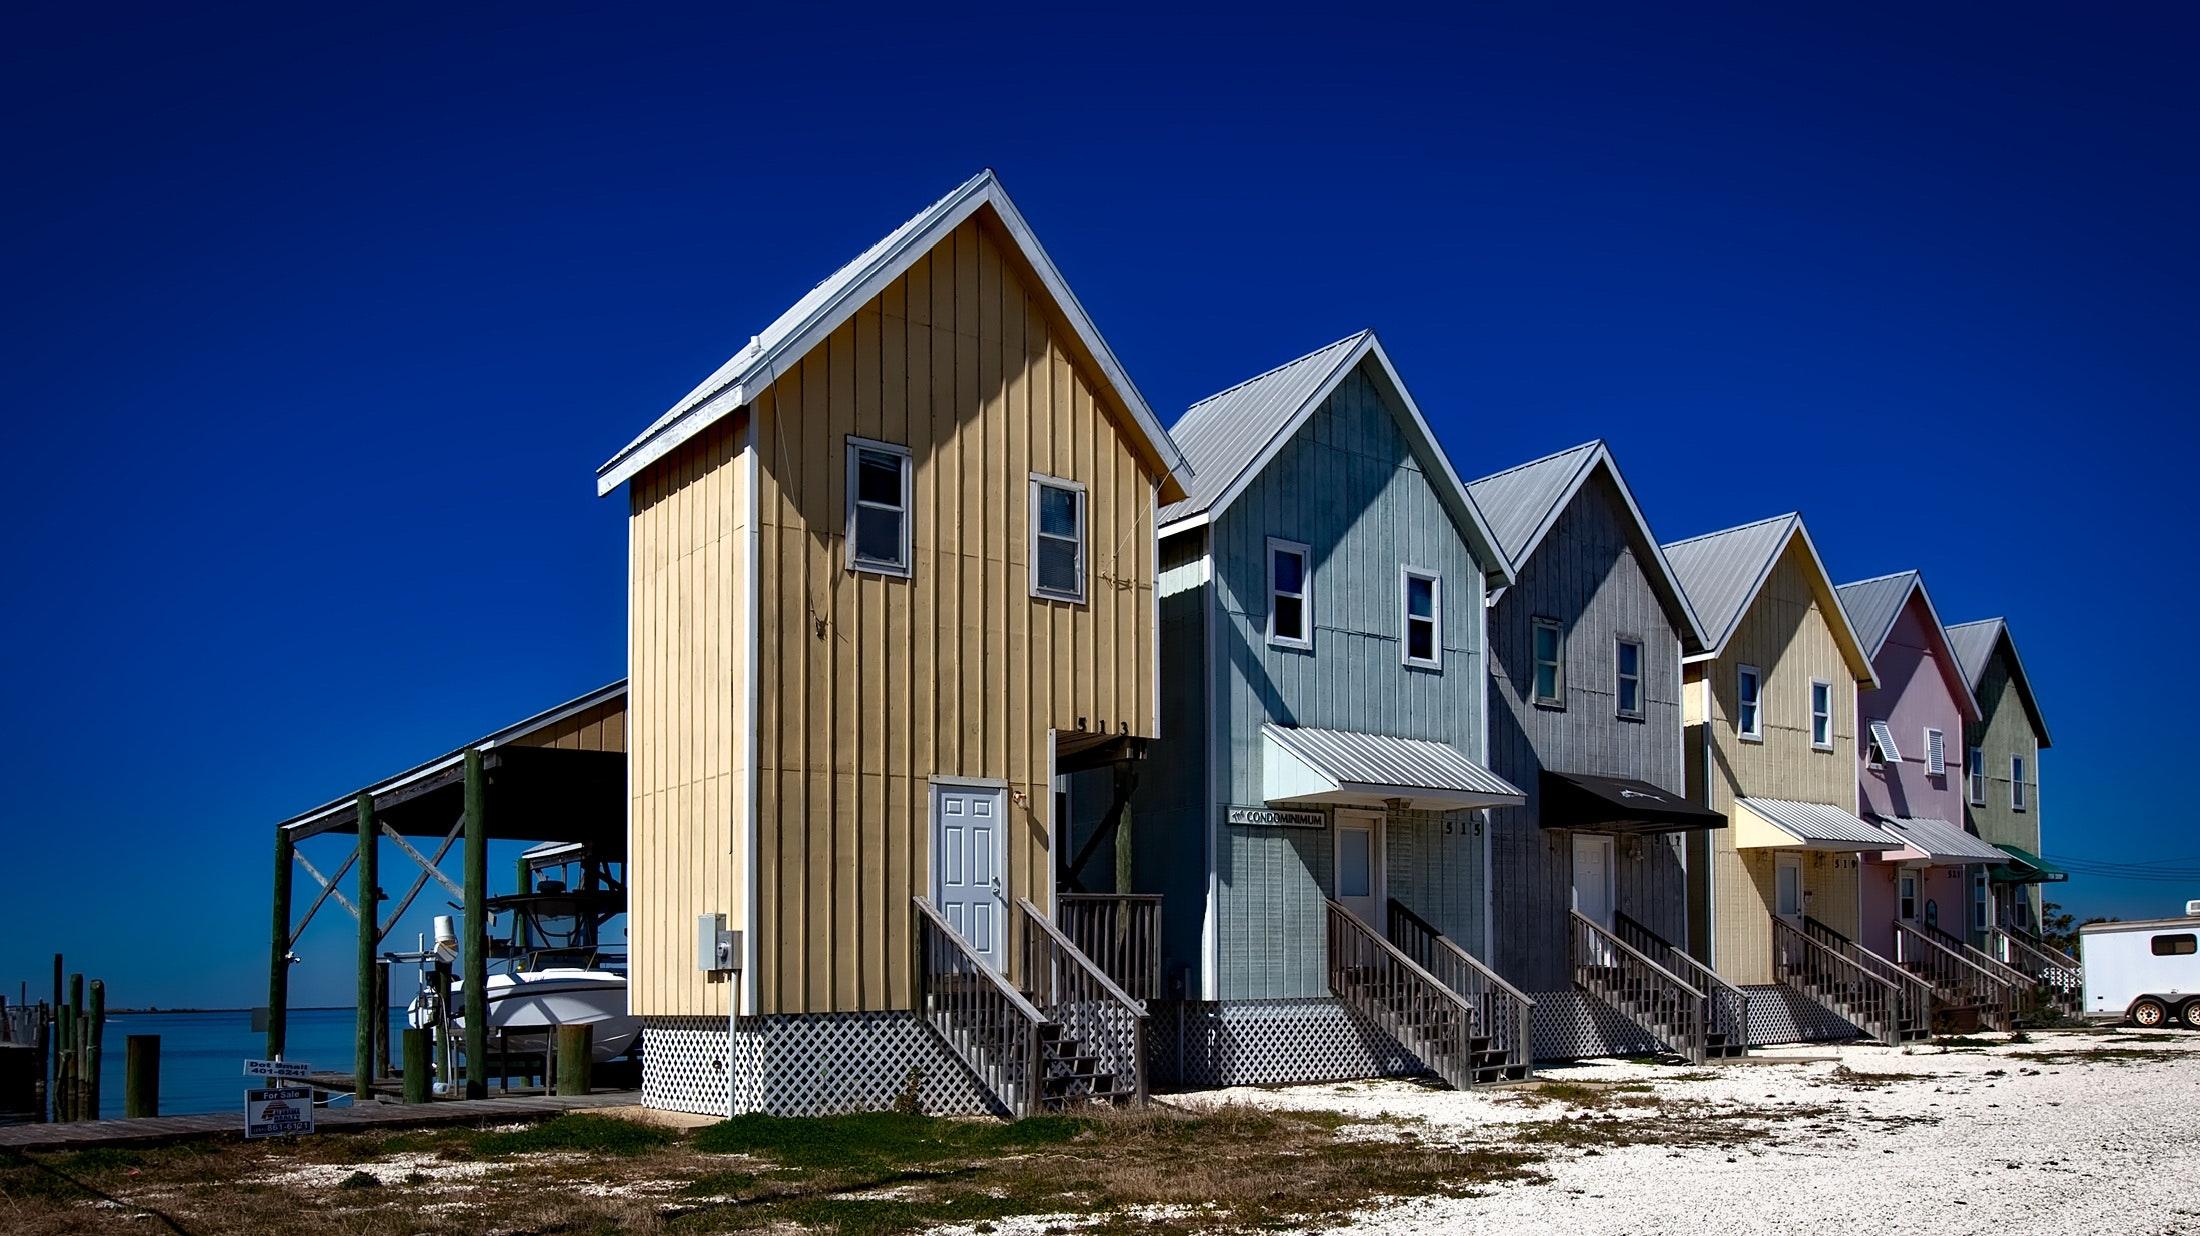 Inline house near seashore during daytime photo